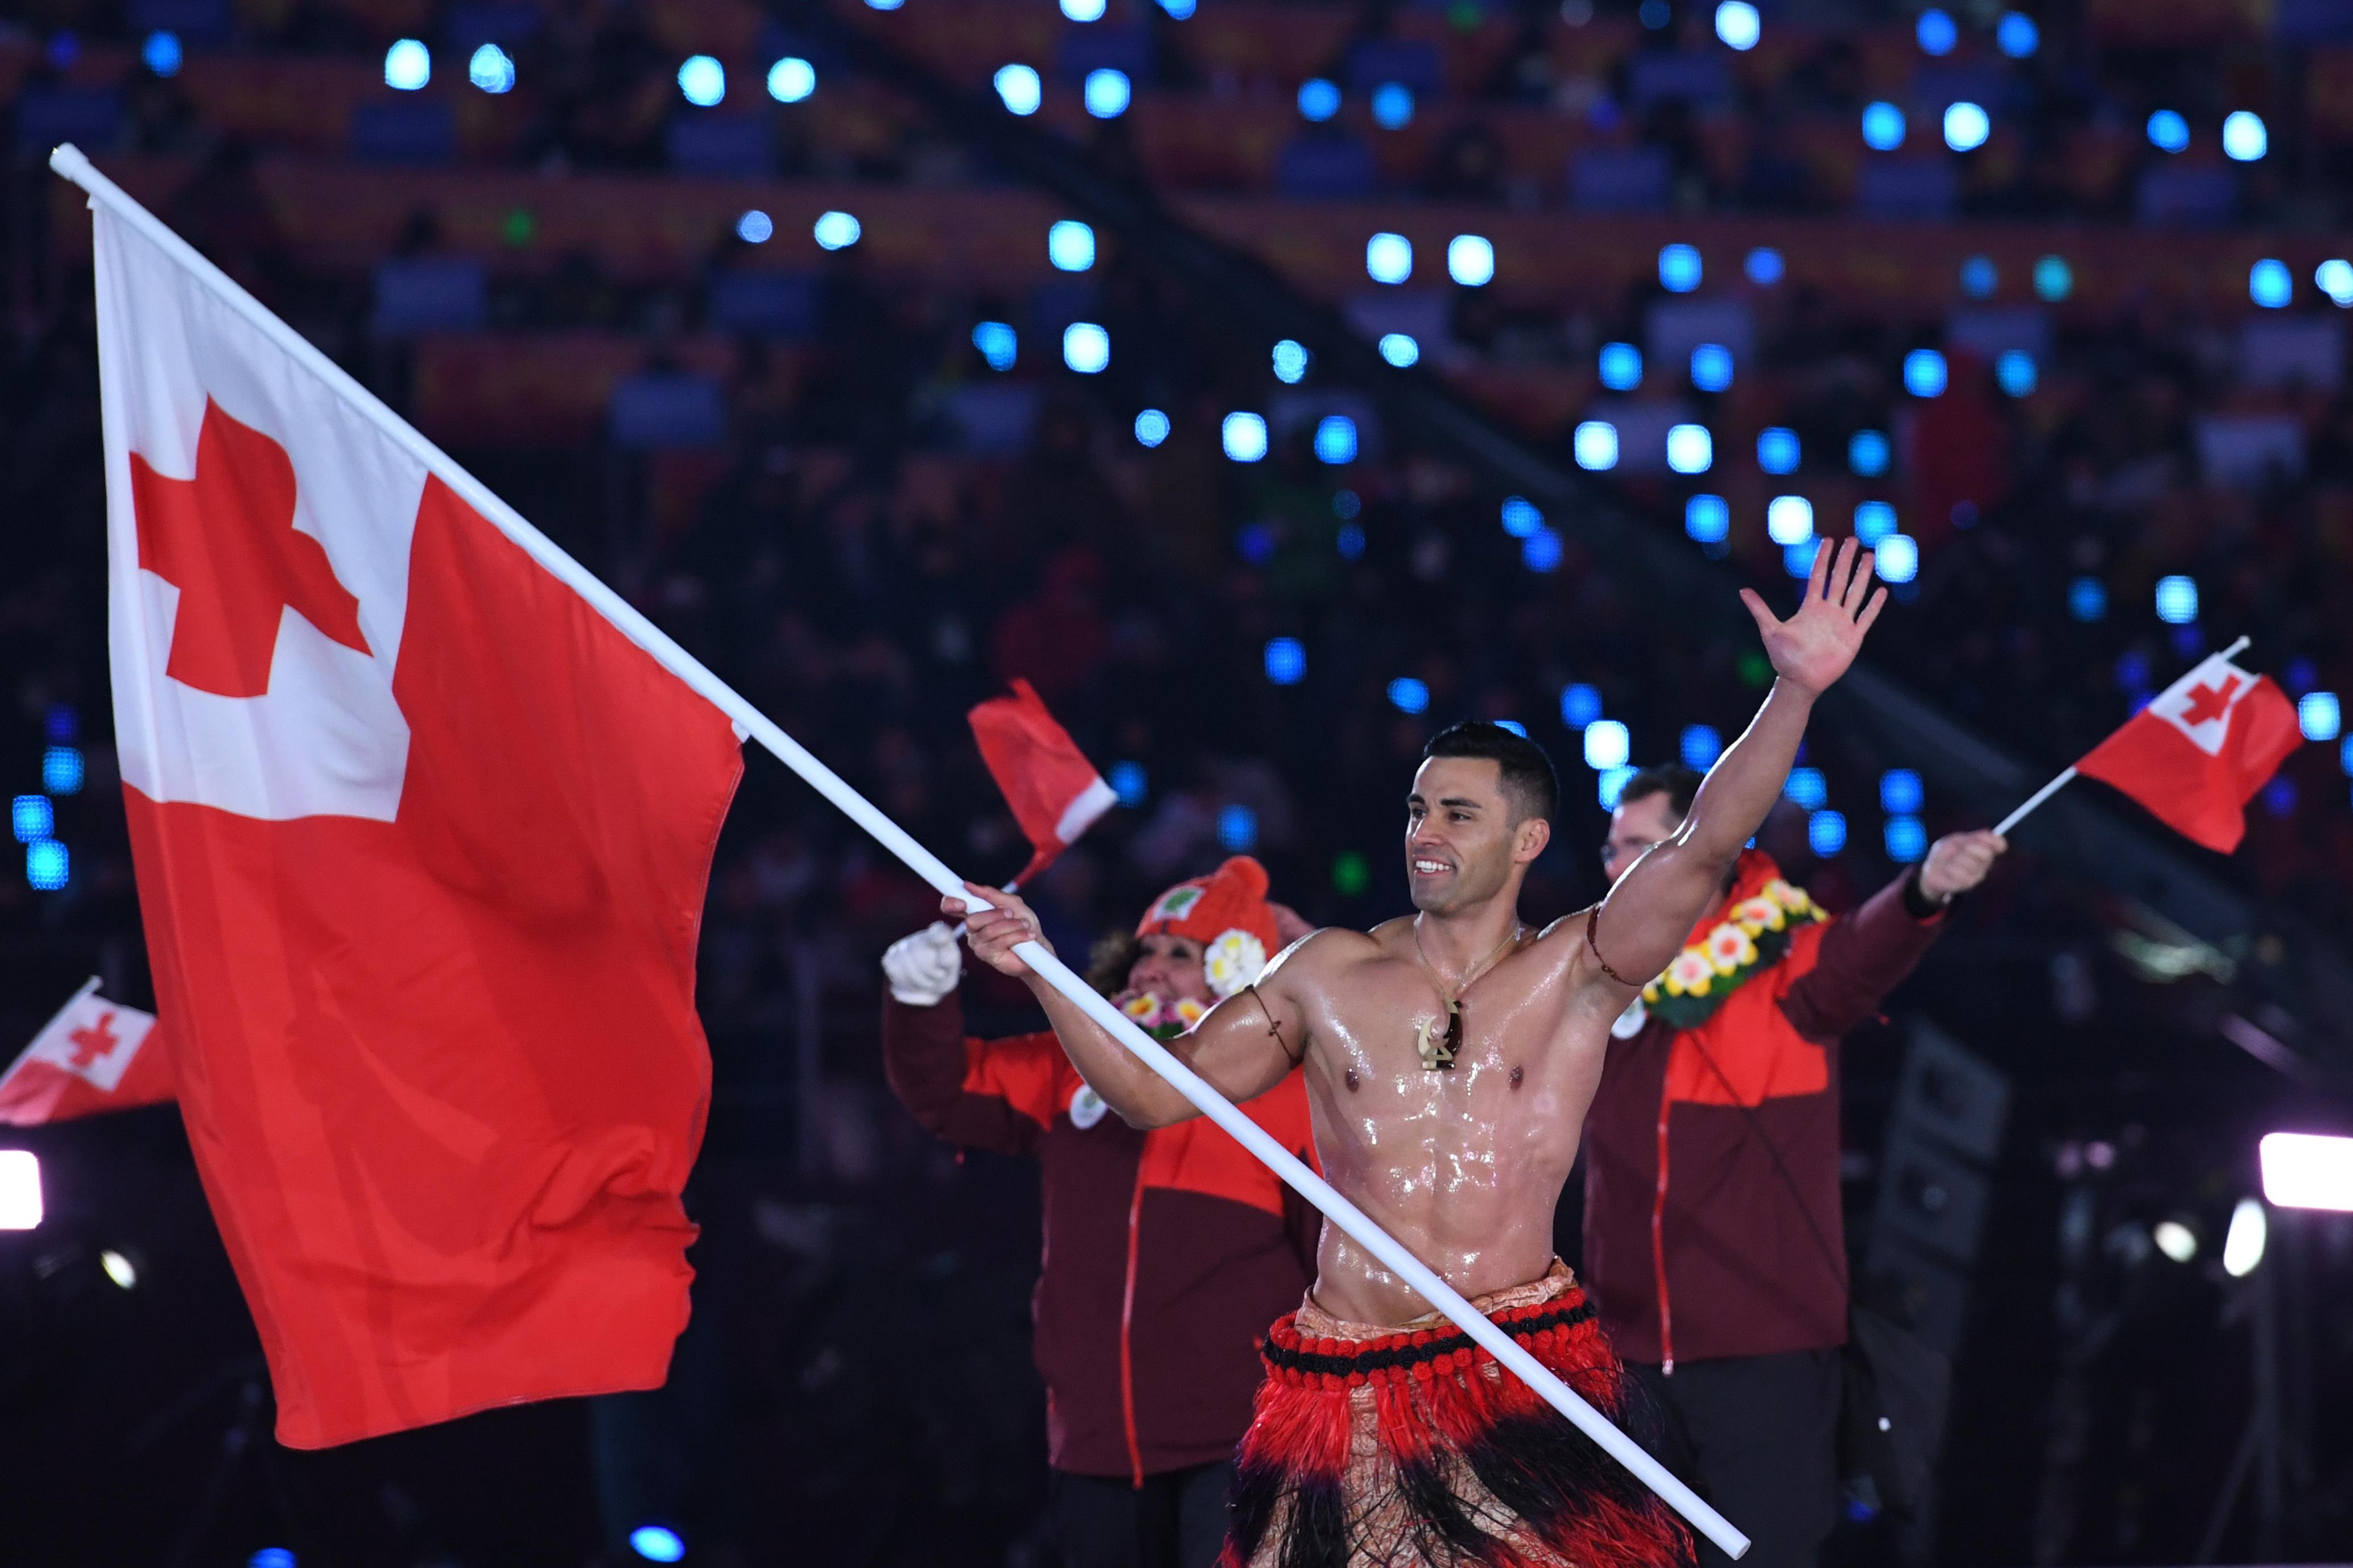 Winter Olympics: Shirtless Tongan Flag Bearer Goes Viral (Again)